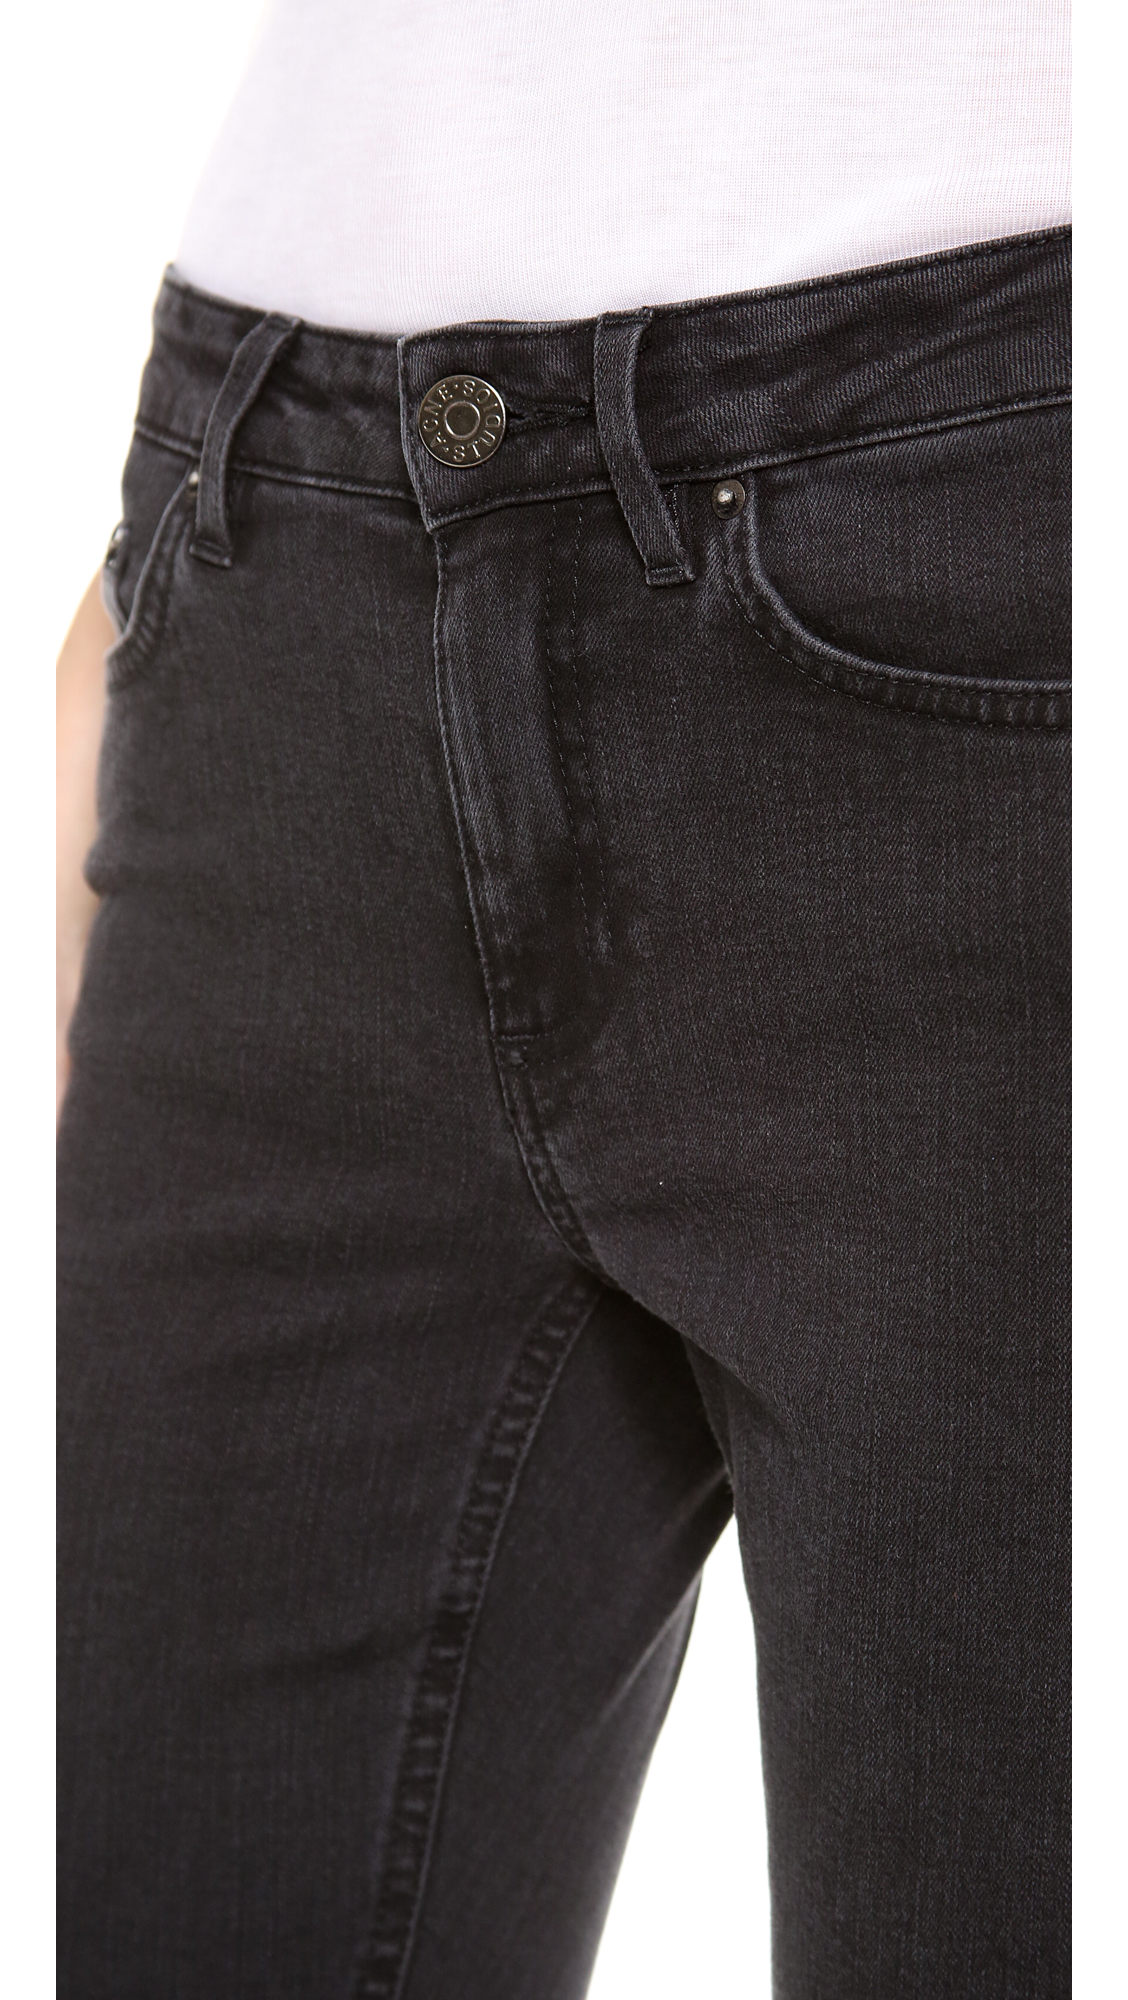 Acne Studios Skin 5 Jeans Shopbop Vintage Rip Off Stretch Soft